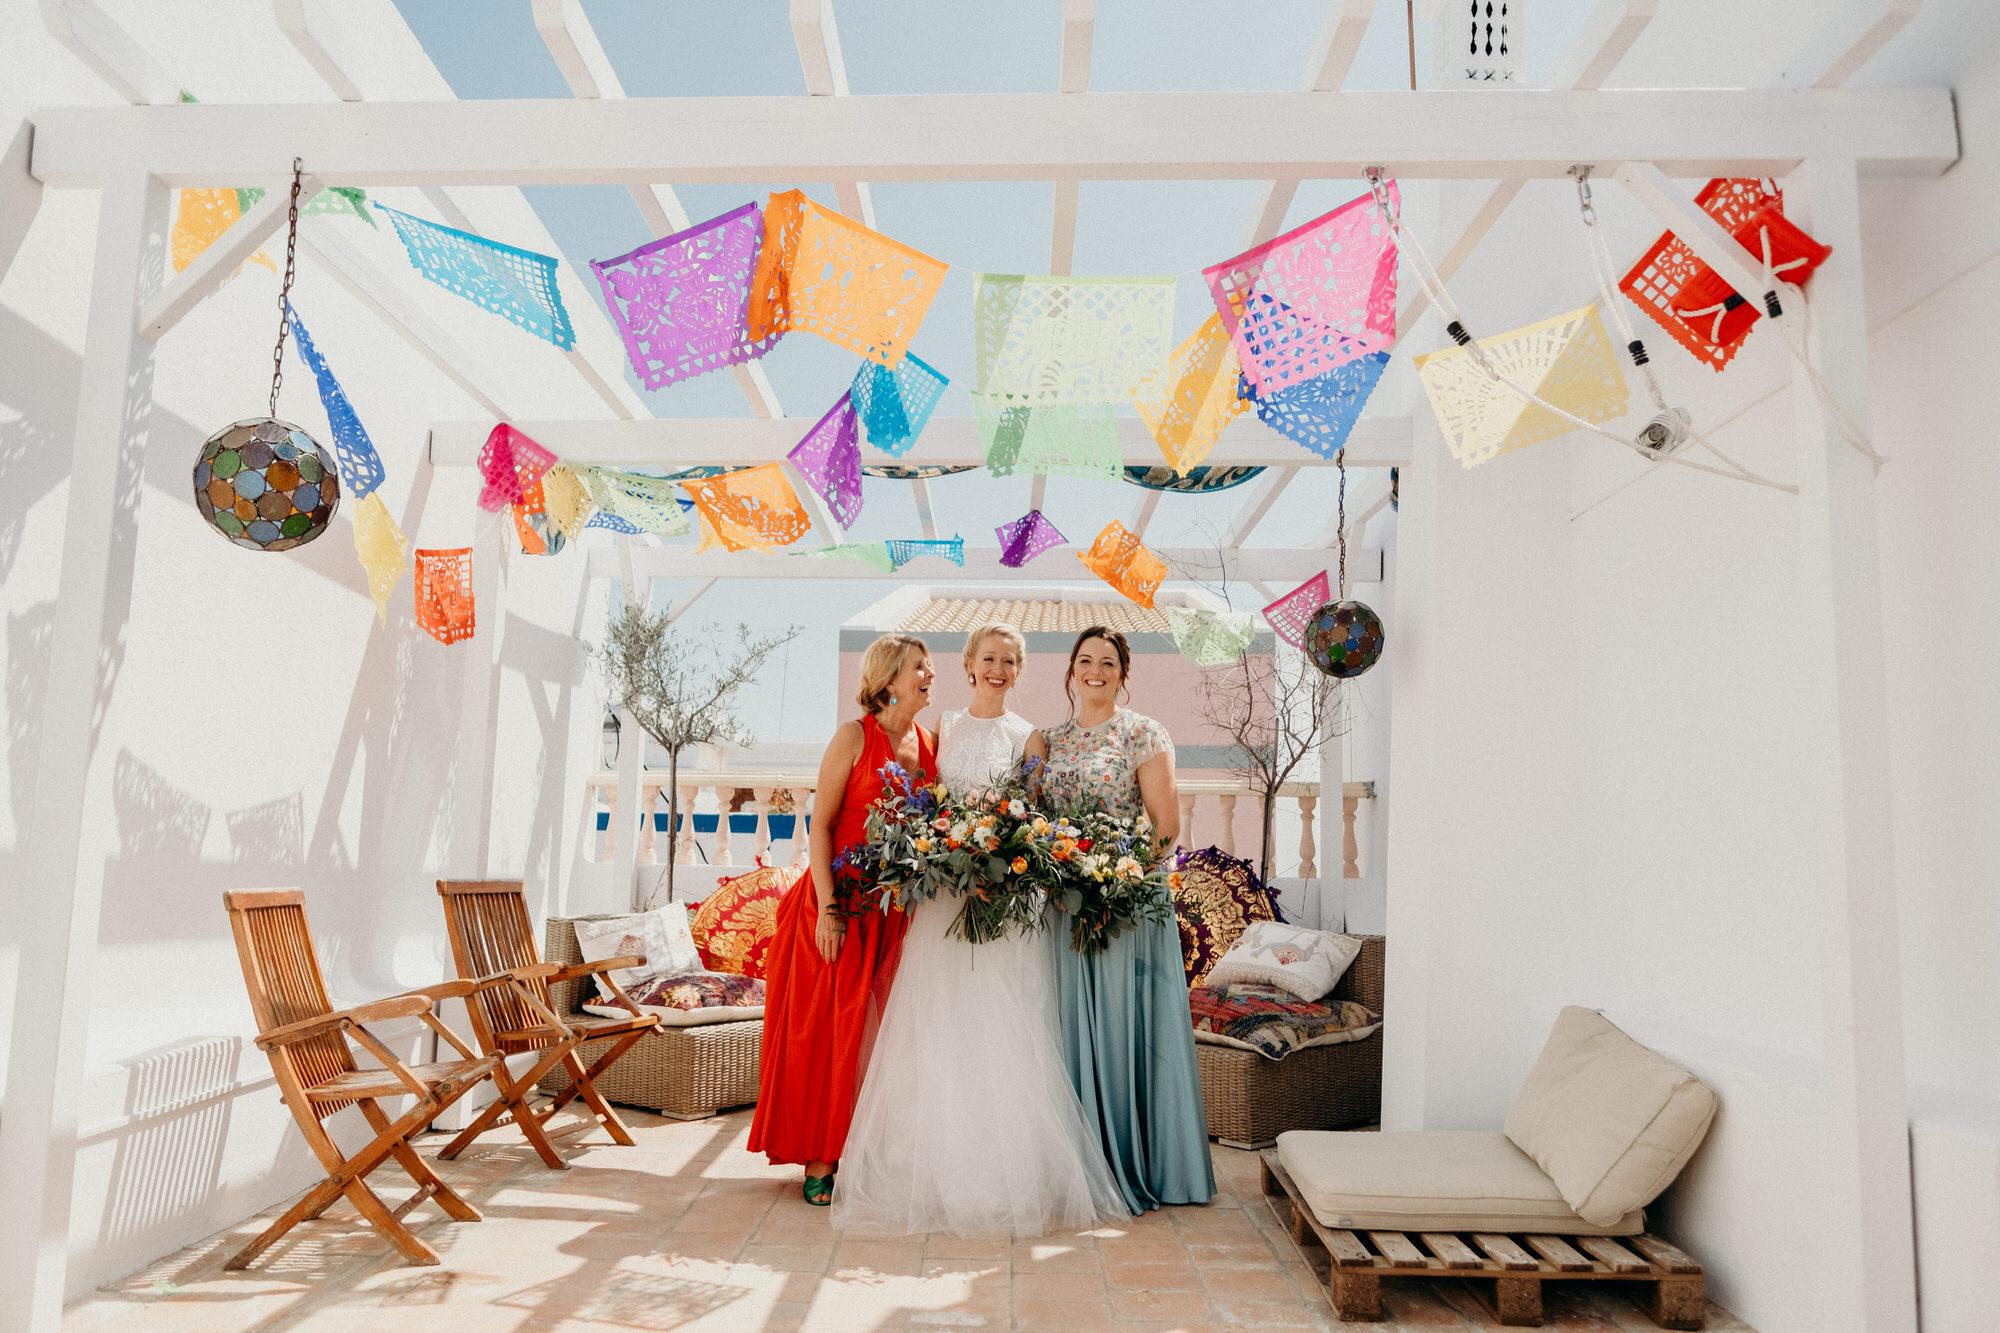 010-Leigh-Chris-Portugal-Wedding.jpg